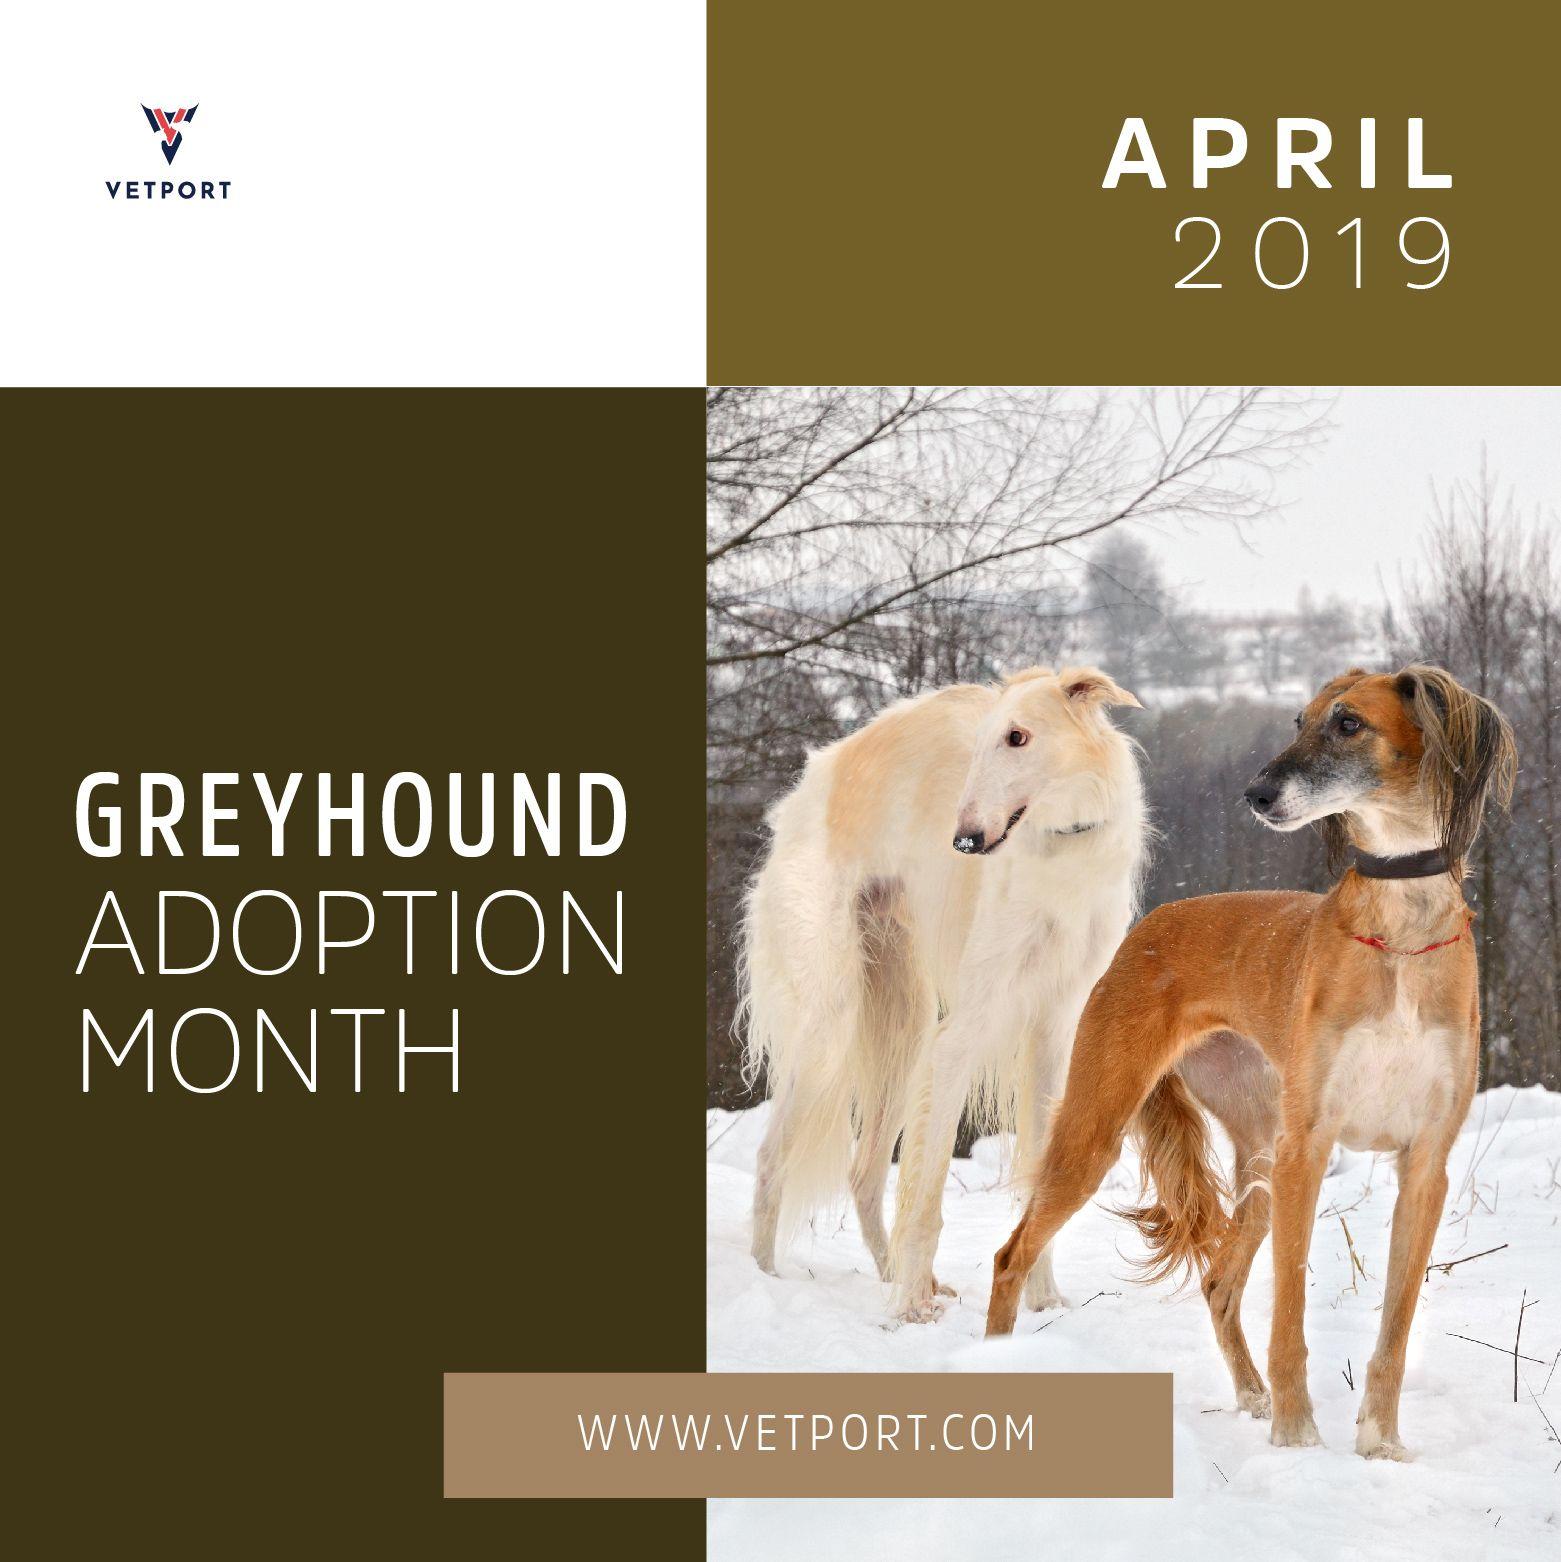 National Greyhound Adoption Month Greyhound Adoption Greyhound Veterinary